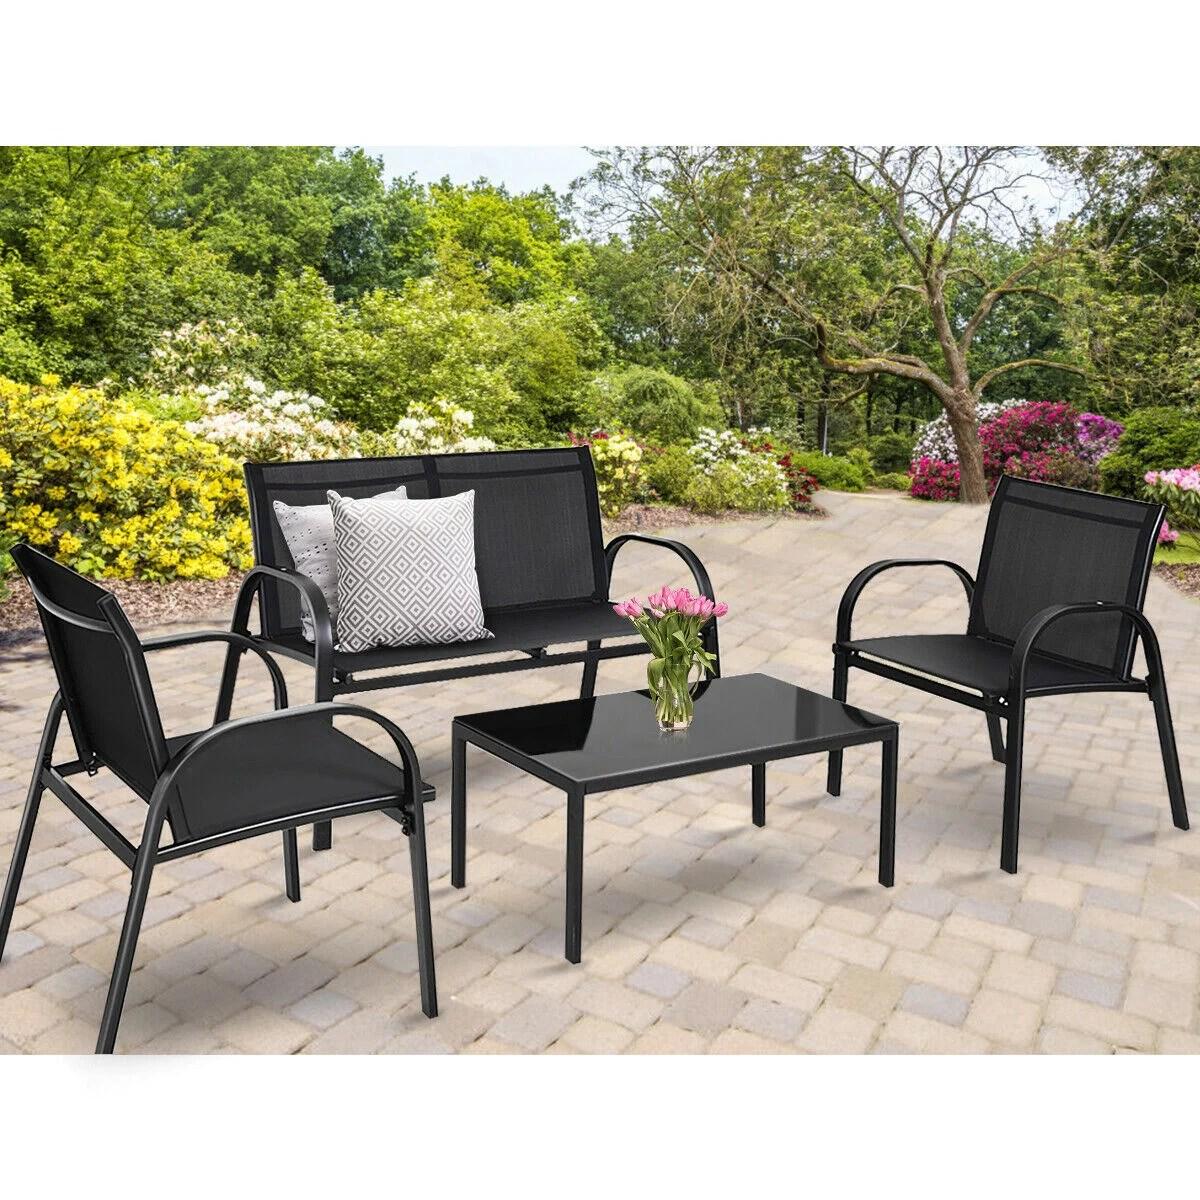 costway 4 pcs patio furniture set sofa coffee table steel frame garden deck black walmart com